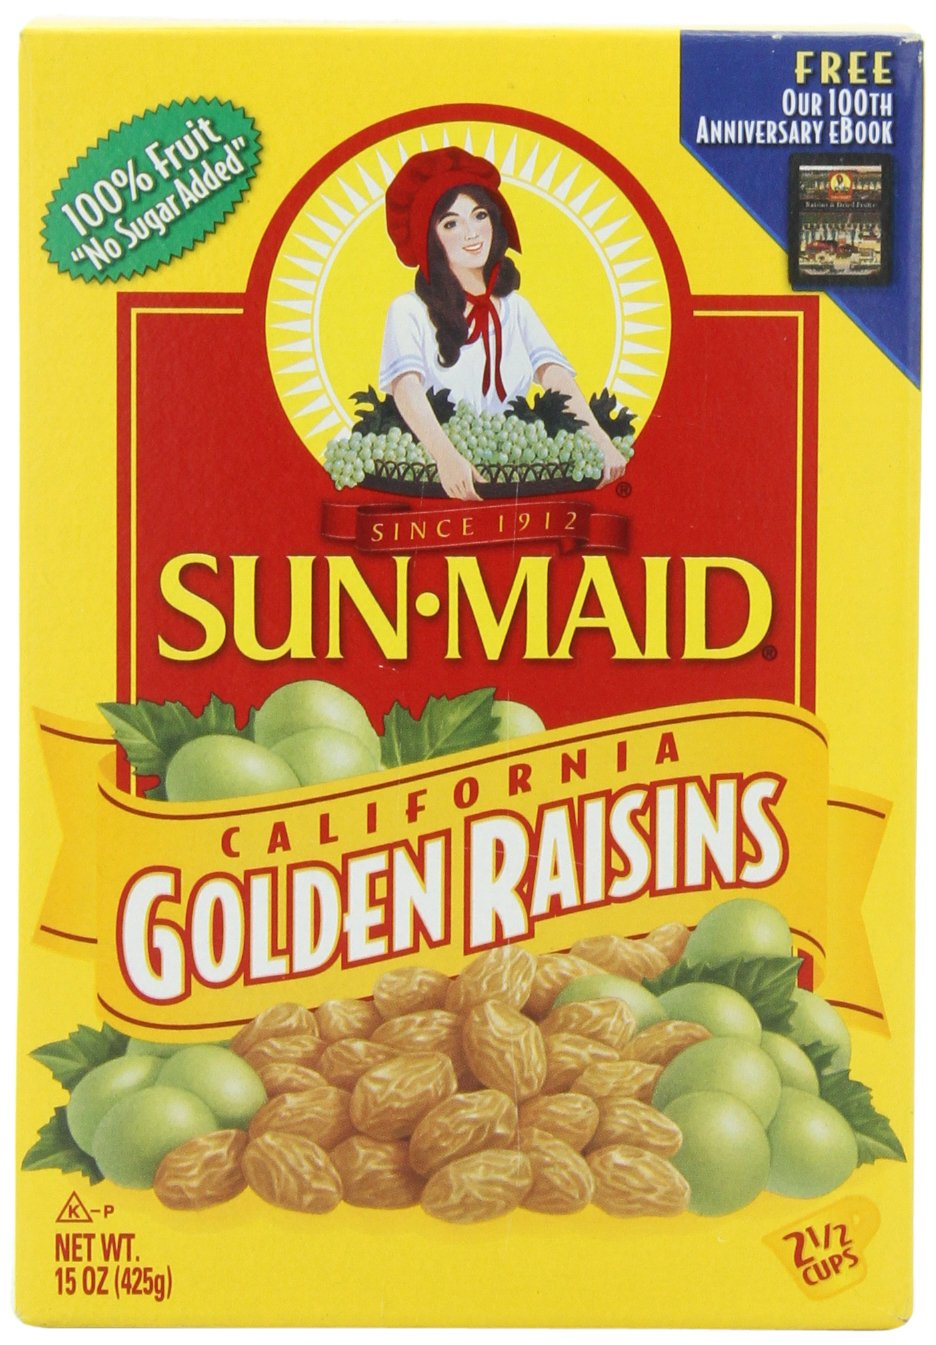 Sun Maid California Golden Raisins, 15-Ounce Boxes (Pack of 6)